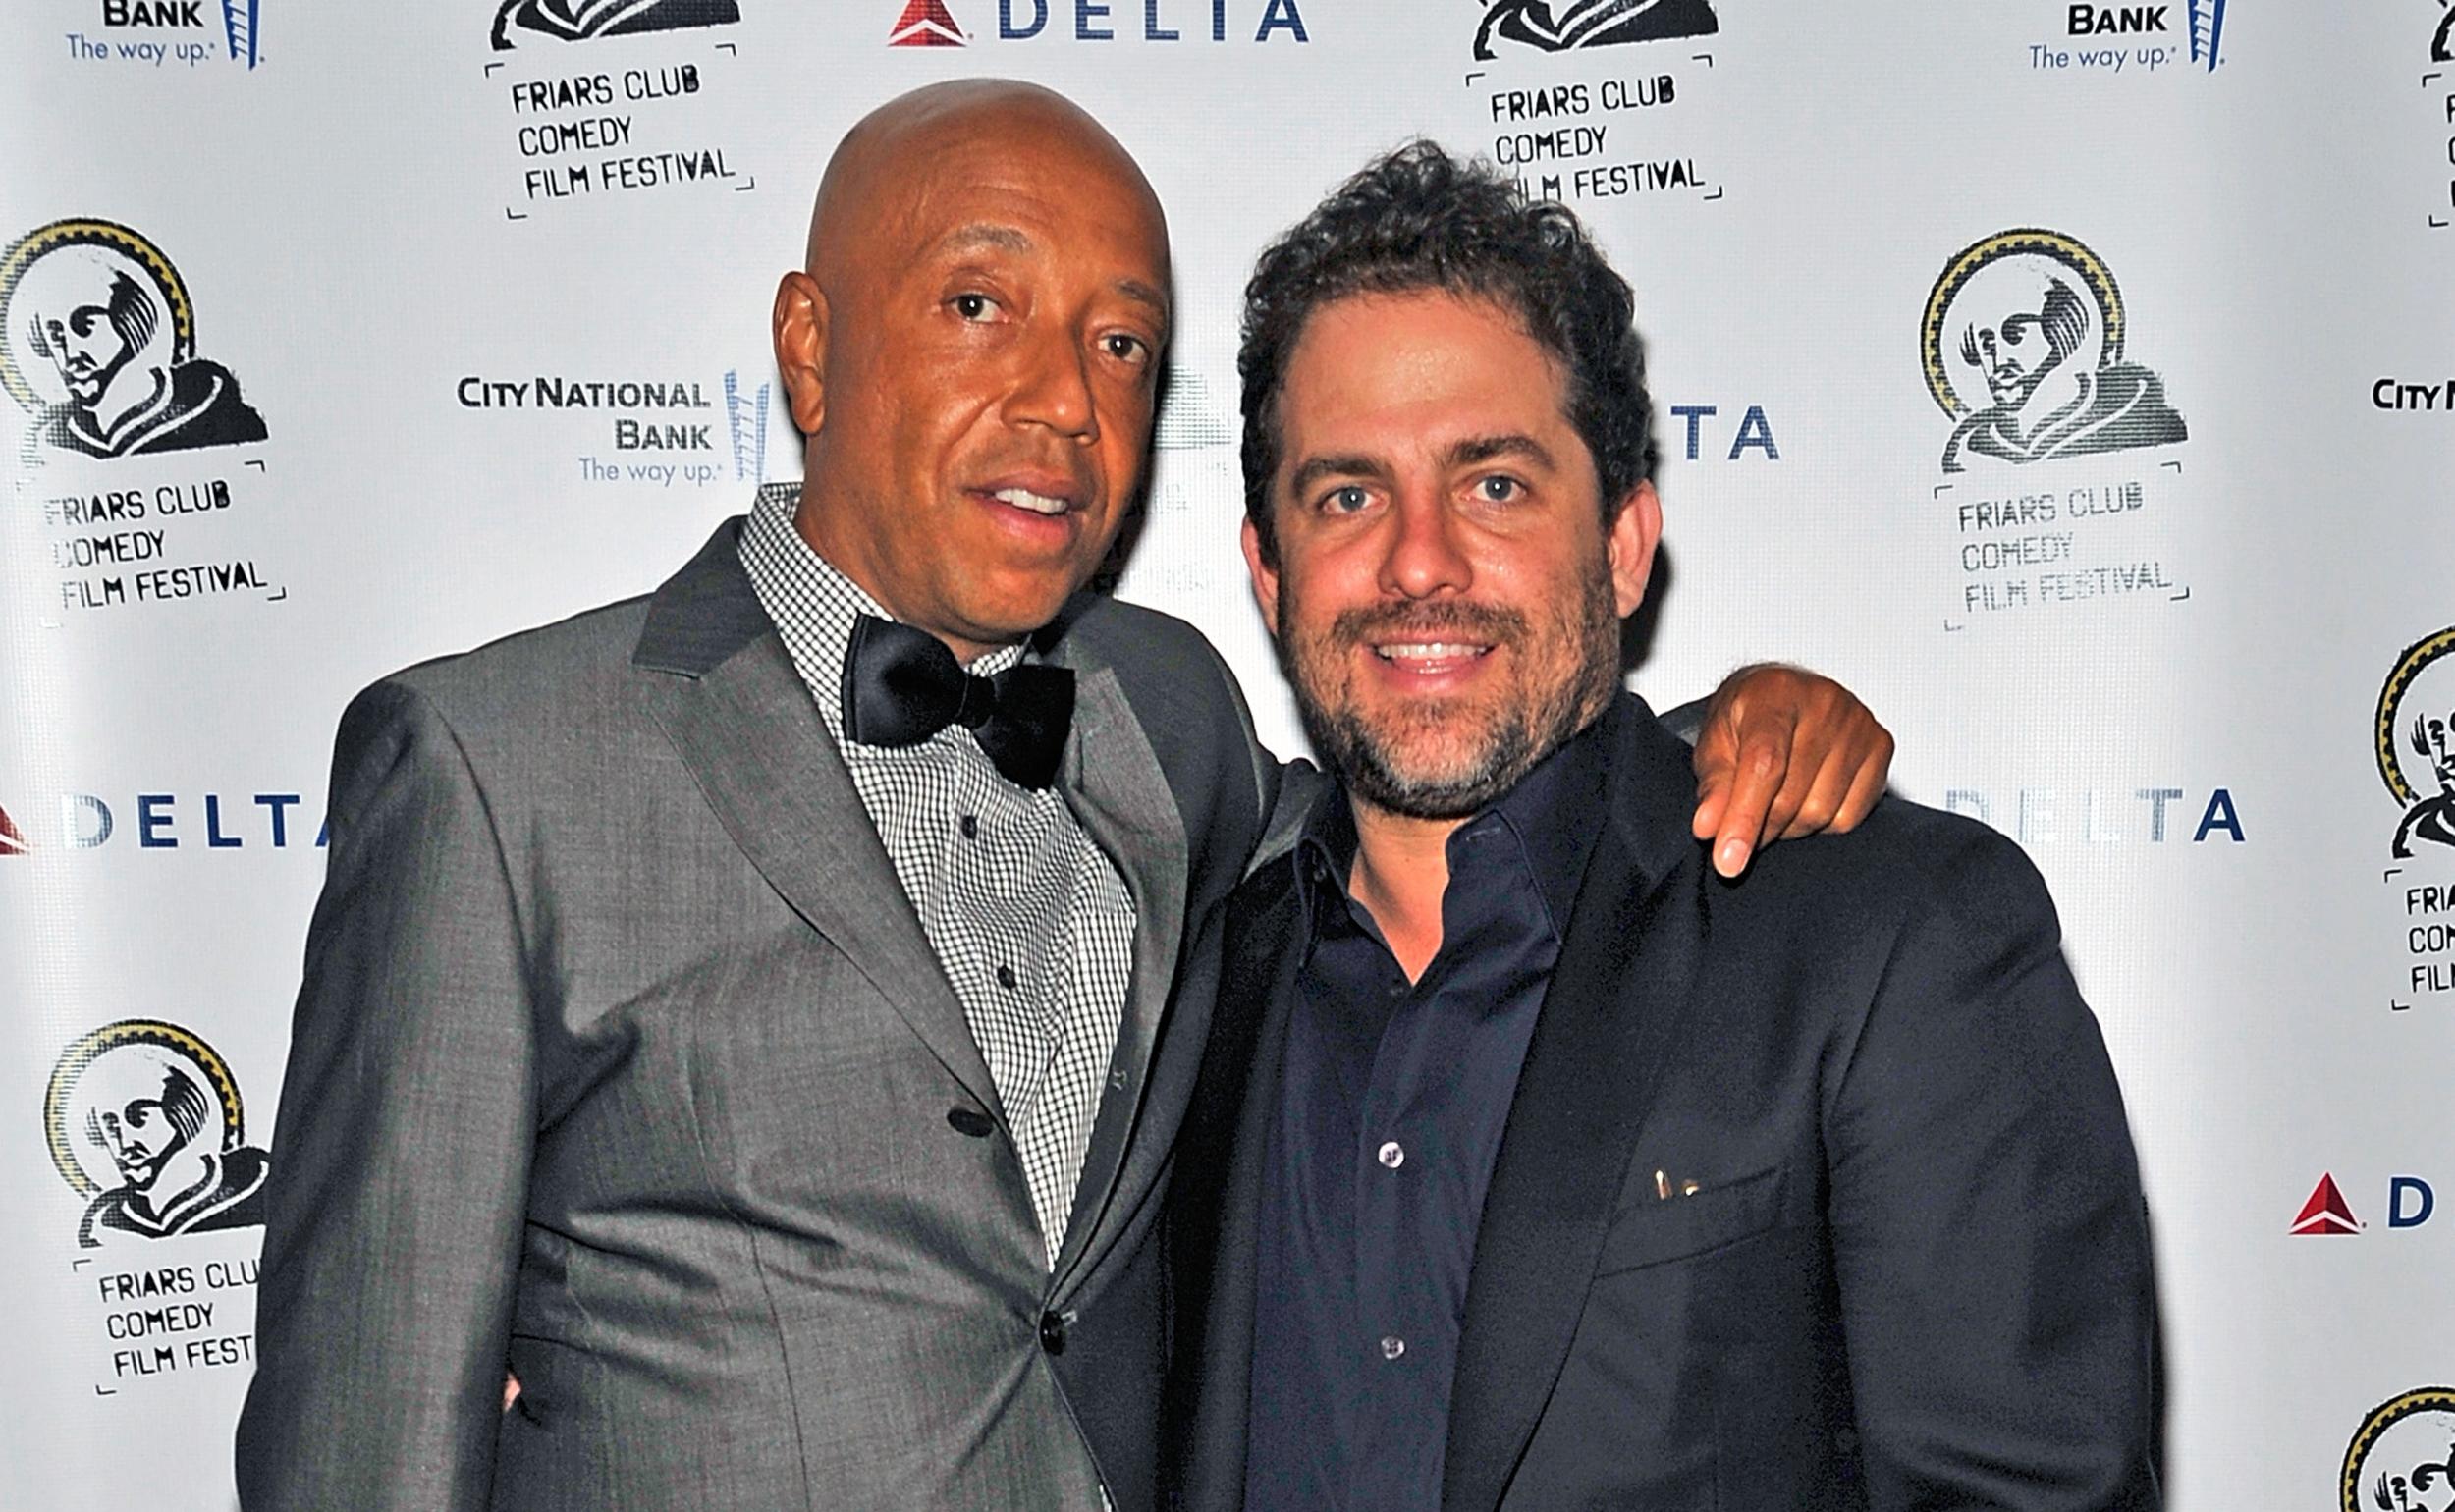 Image: Russell Simmons and Brett Ratner